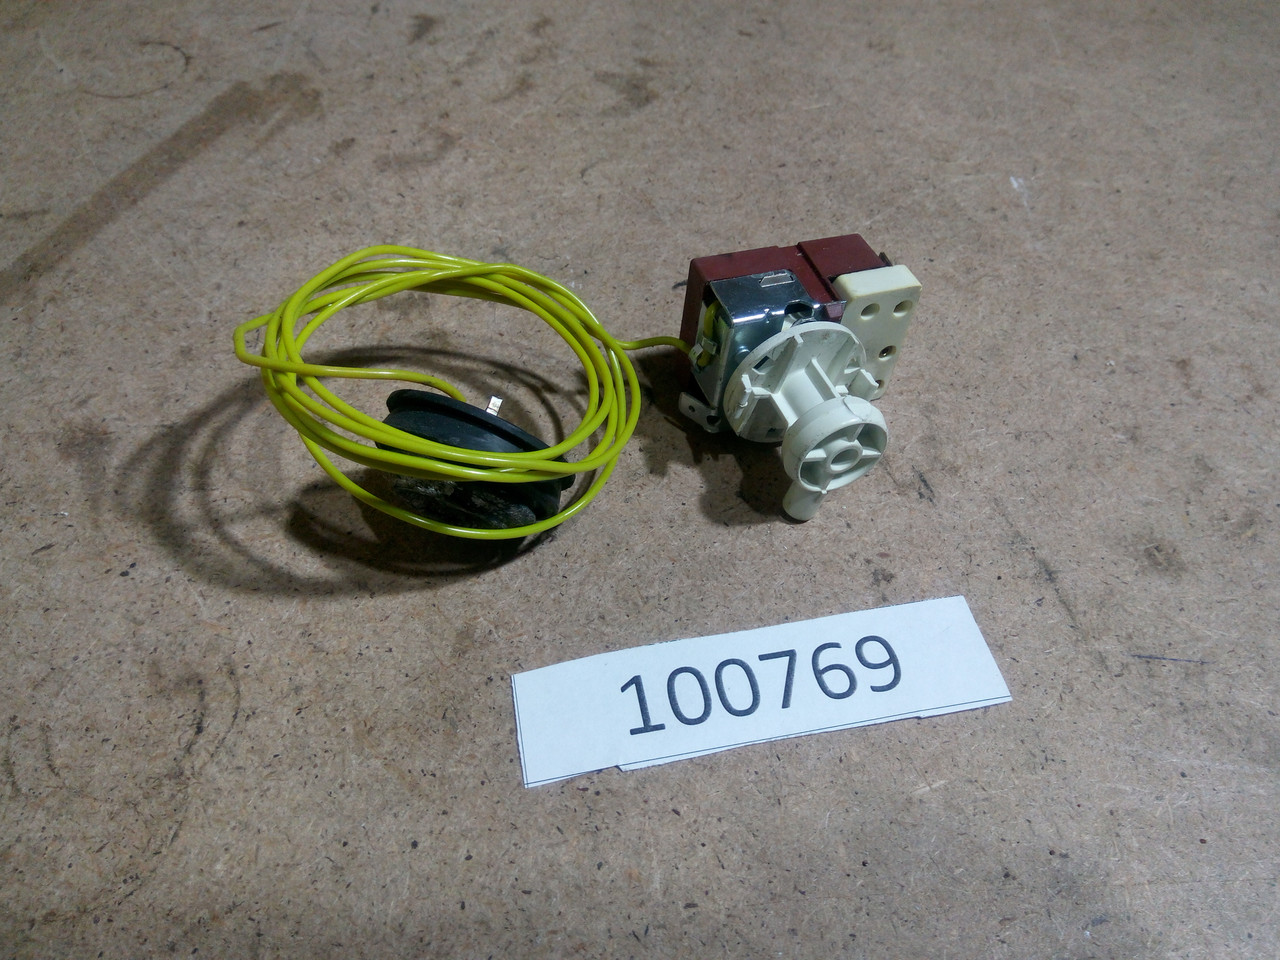 Термостат з датчиком температури Zanussi TA833V. 146305302 Б/У